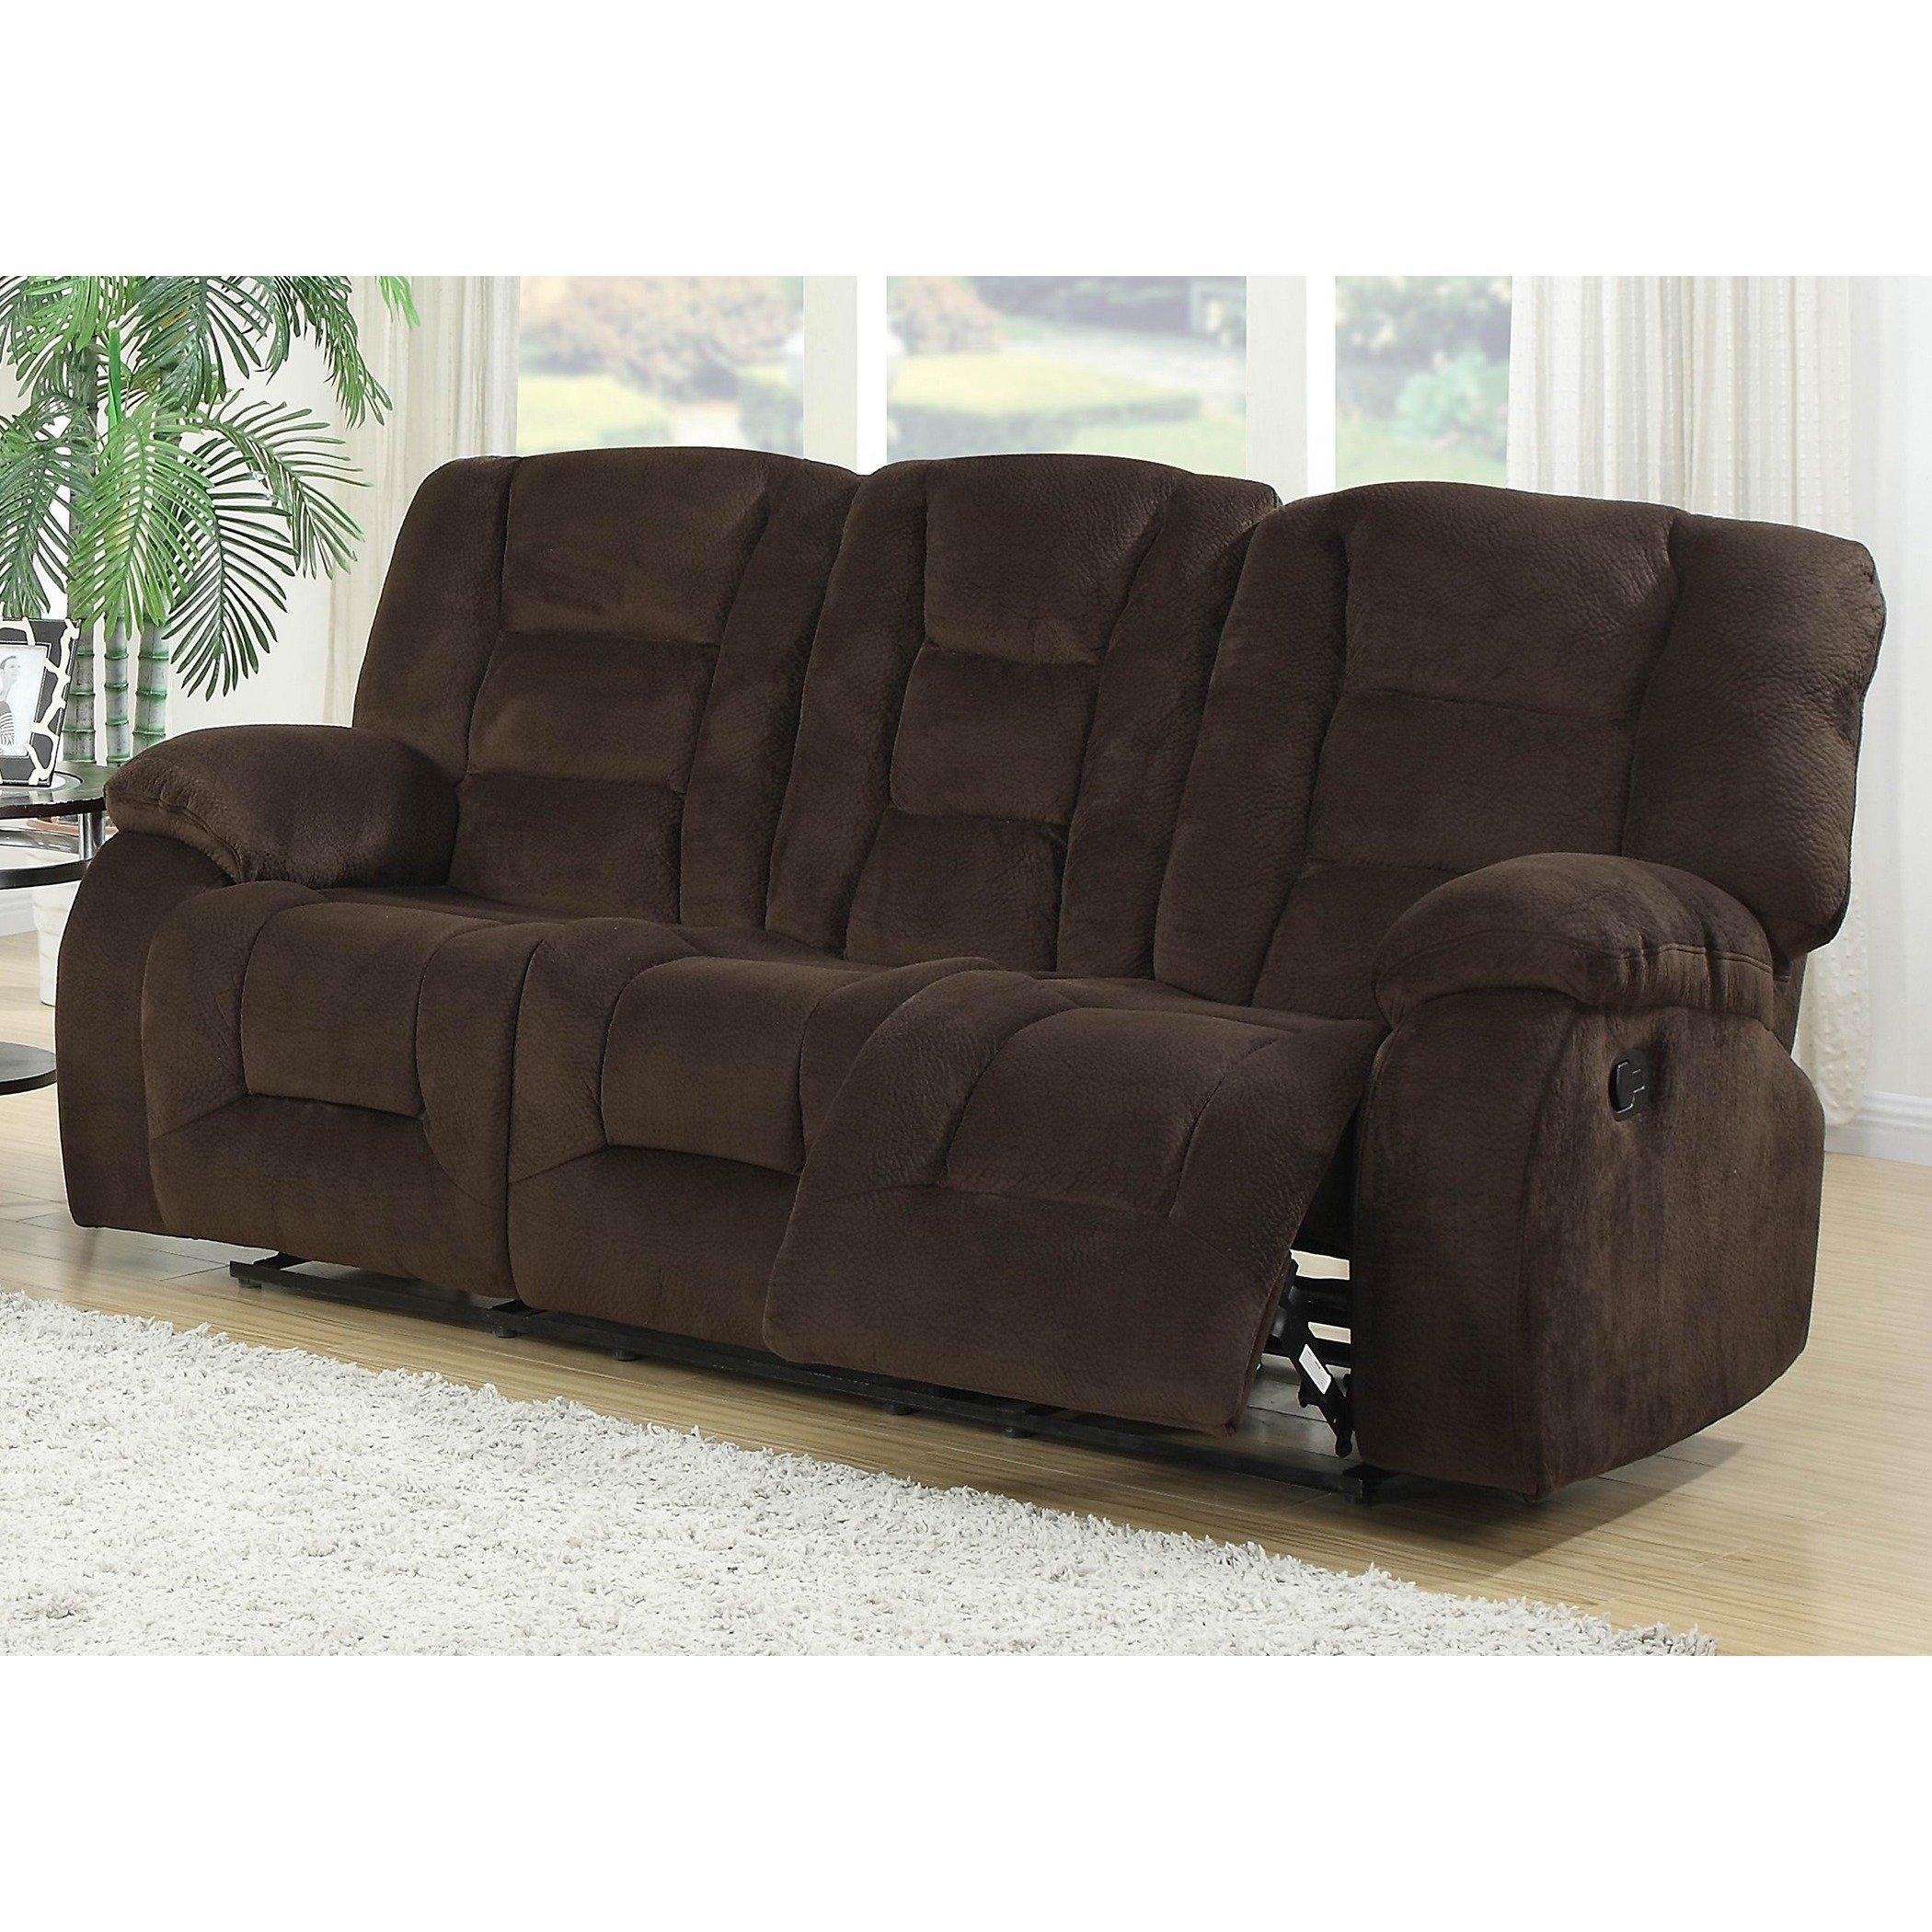 Shop Jackson Dual Reclining Sofa - Free Shipping Today - Overstock regarding Jackson 6 Piece Power Reclining Sectionals (Image 27 of 30)